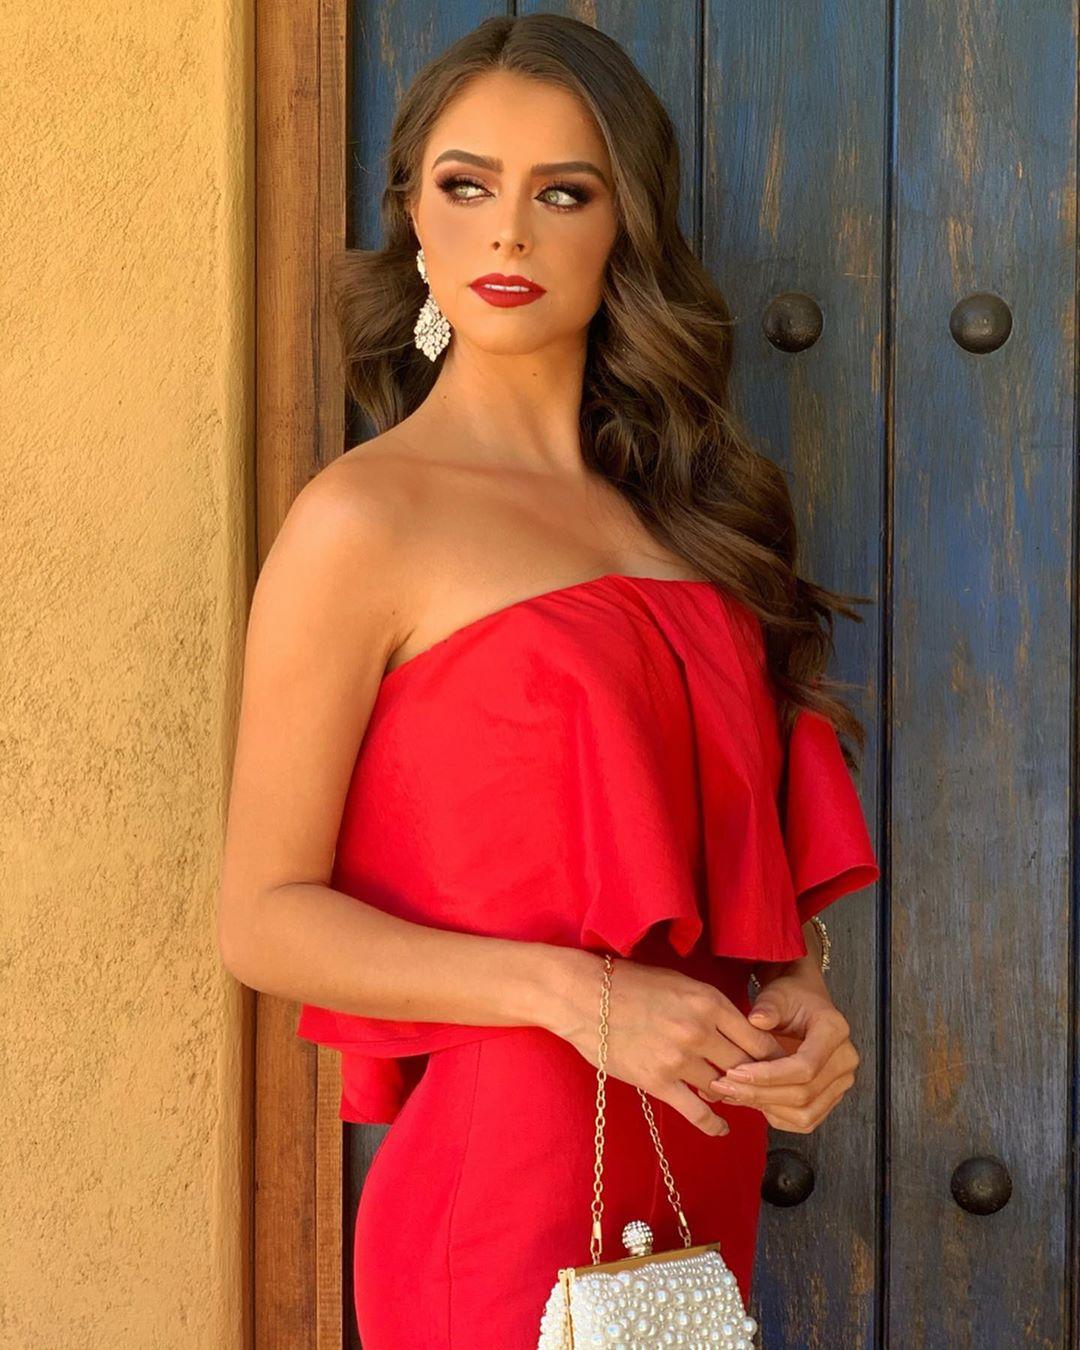 regina peredo, reyna hispanoamericana 2019. - Página 2 75259517